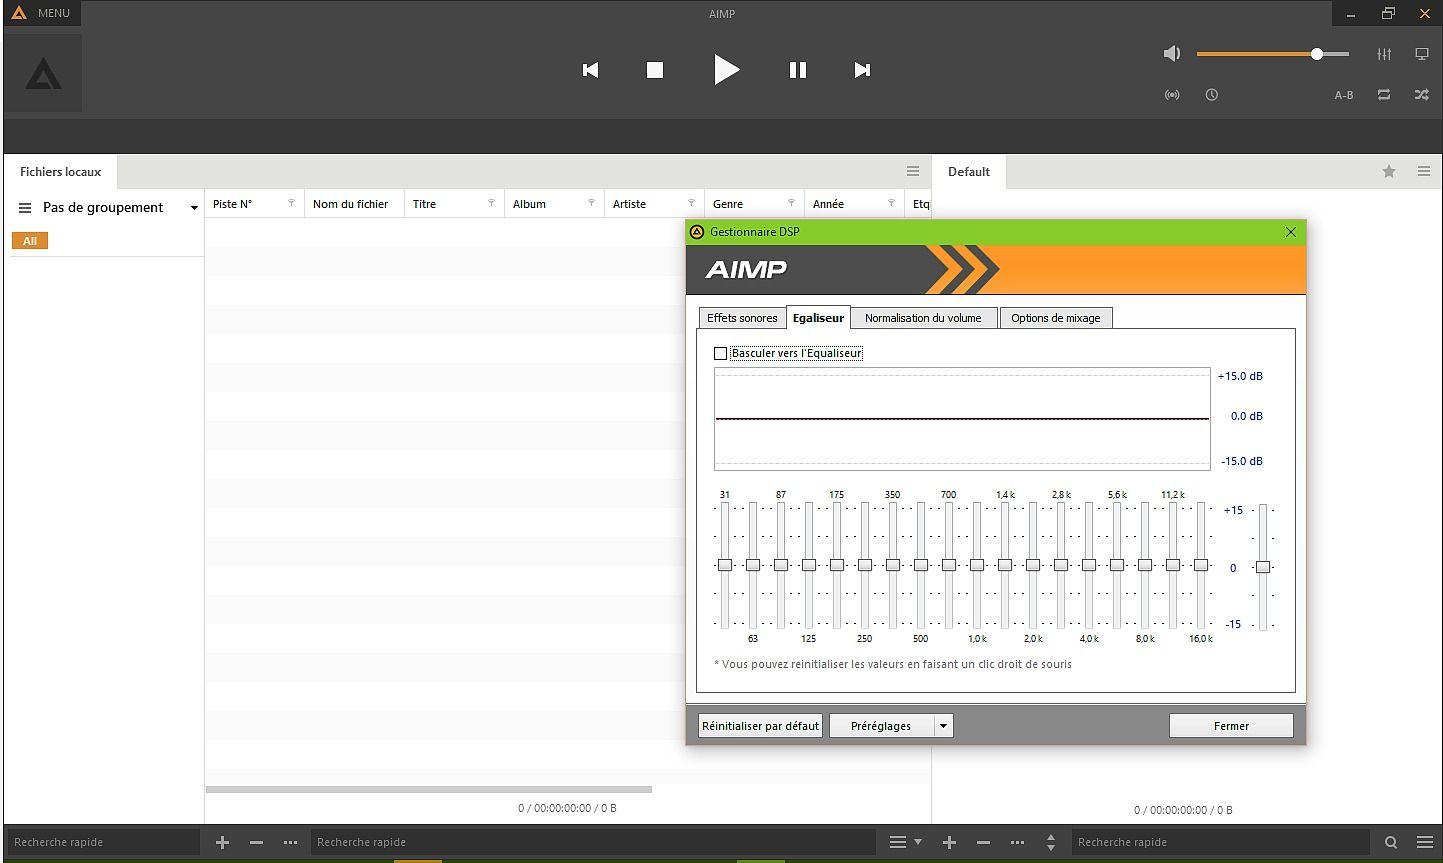 AIMP Multimédia